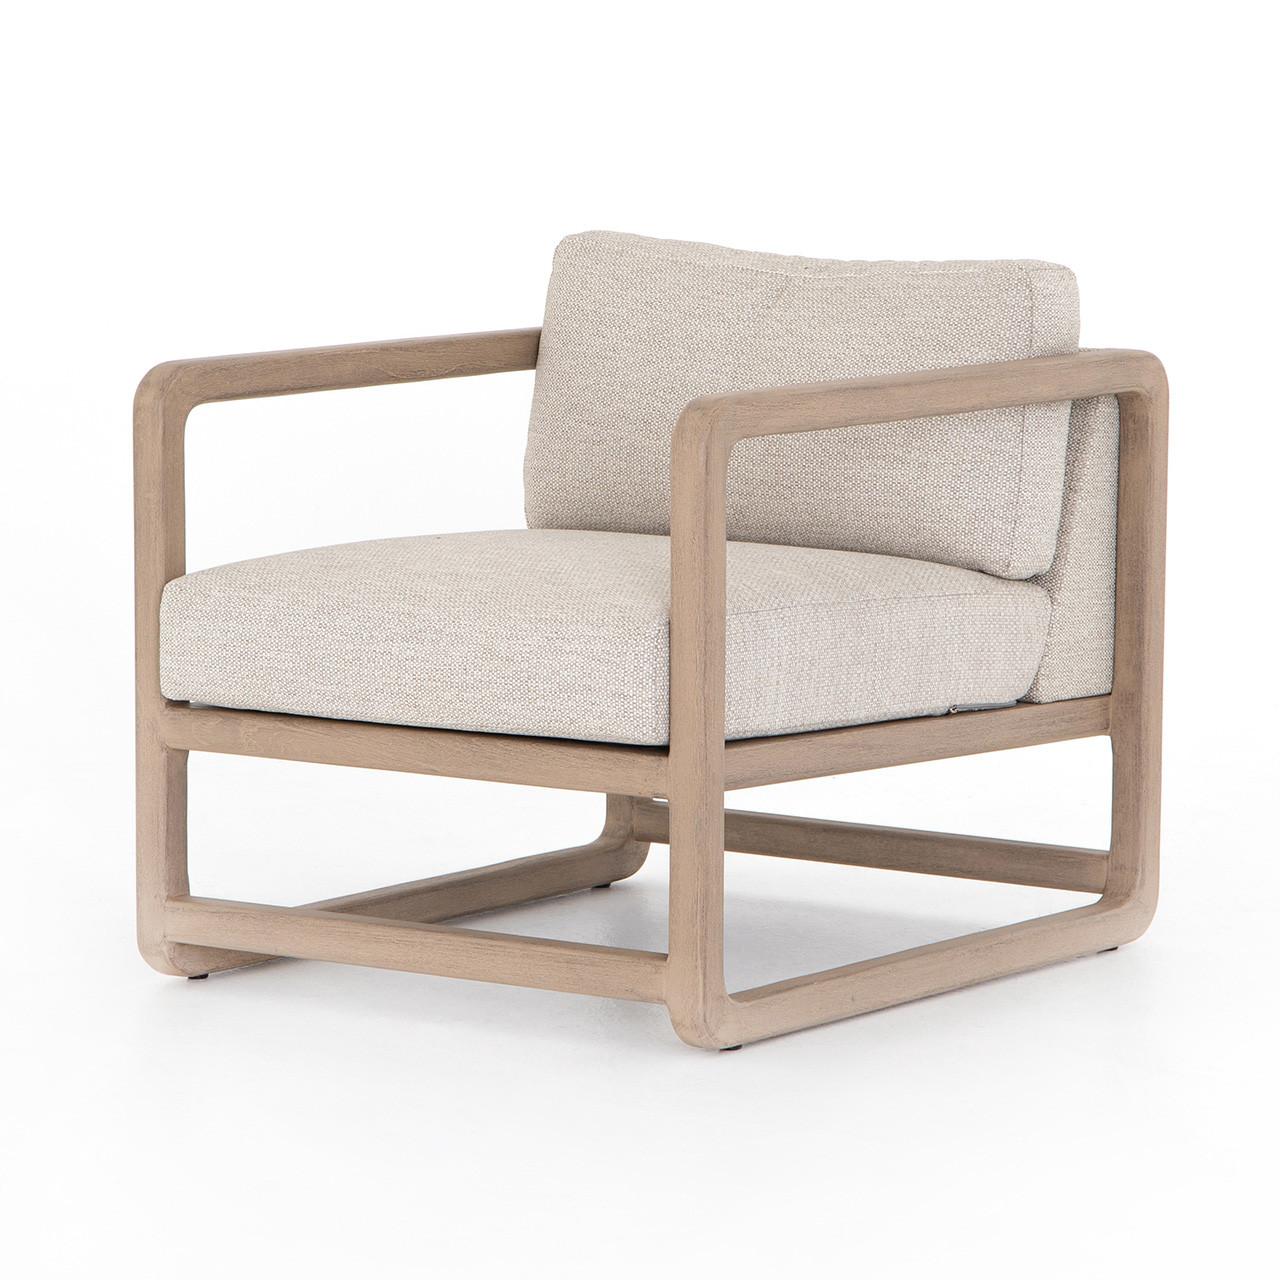 Cardiff Outdoor Teak Lounge Chair